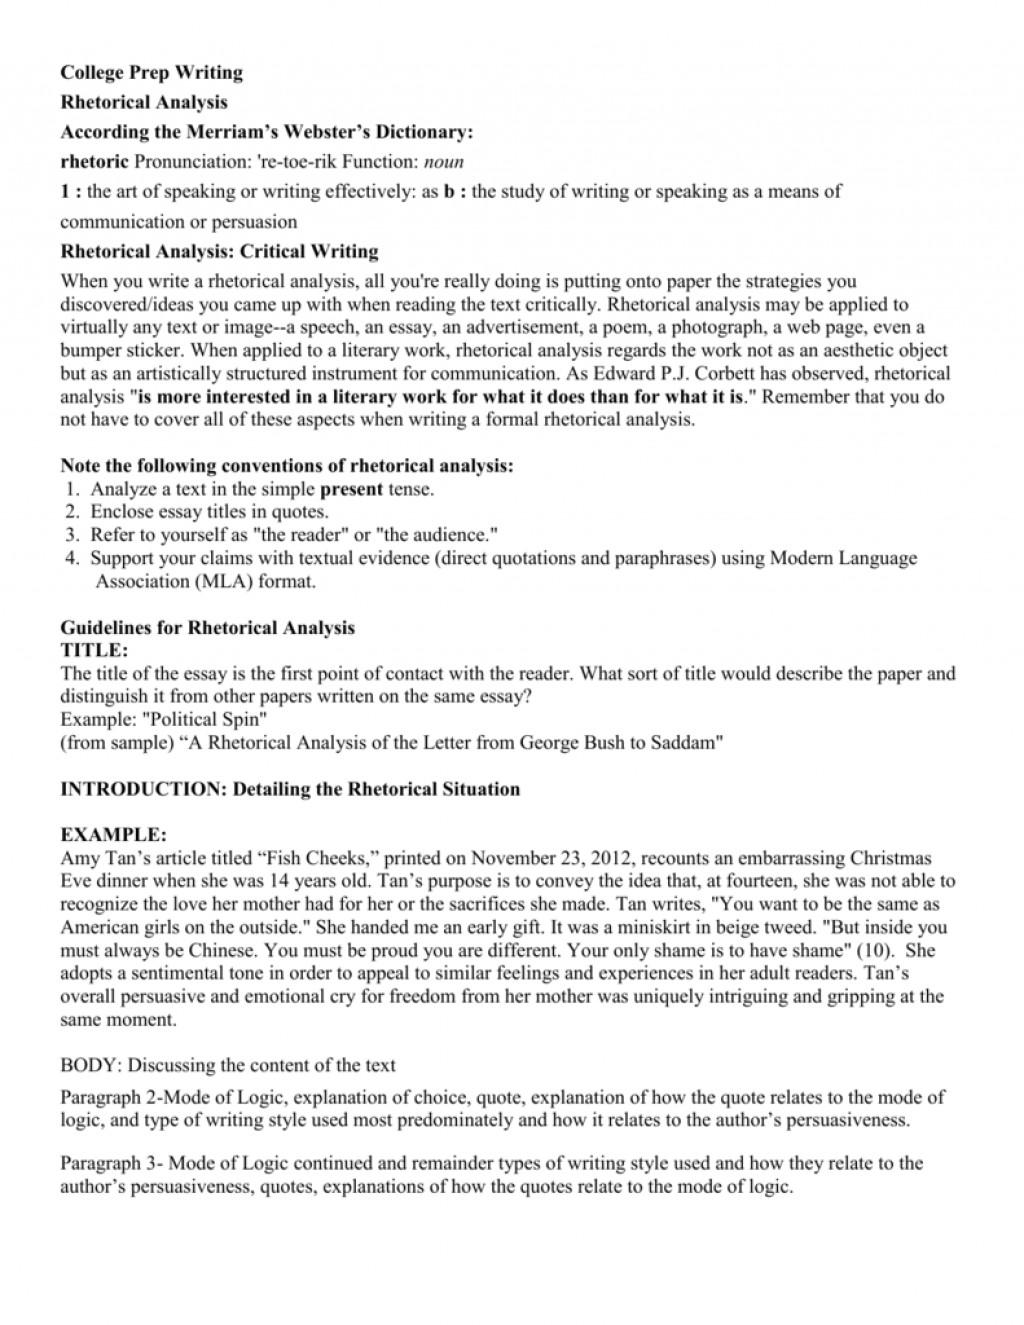 009 Essay Example 007662368 2 Impressive Rhetorical Ap Lang Analysis 2016 Devices Examples English Large